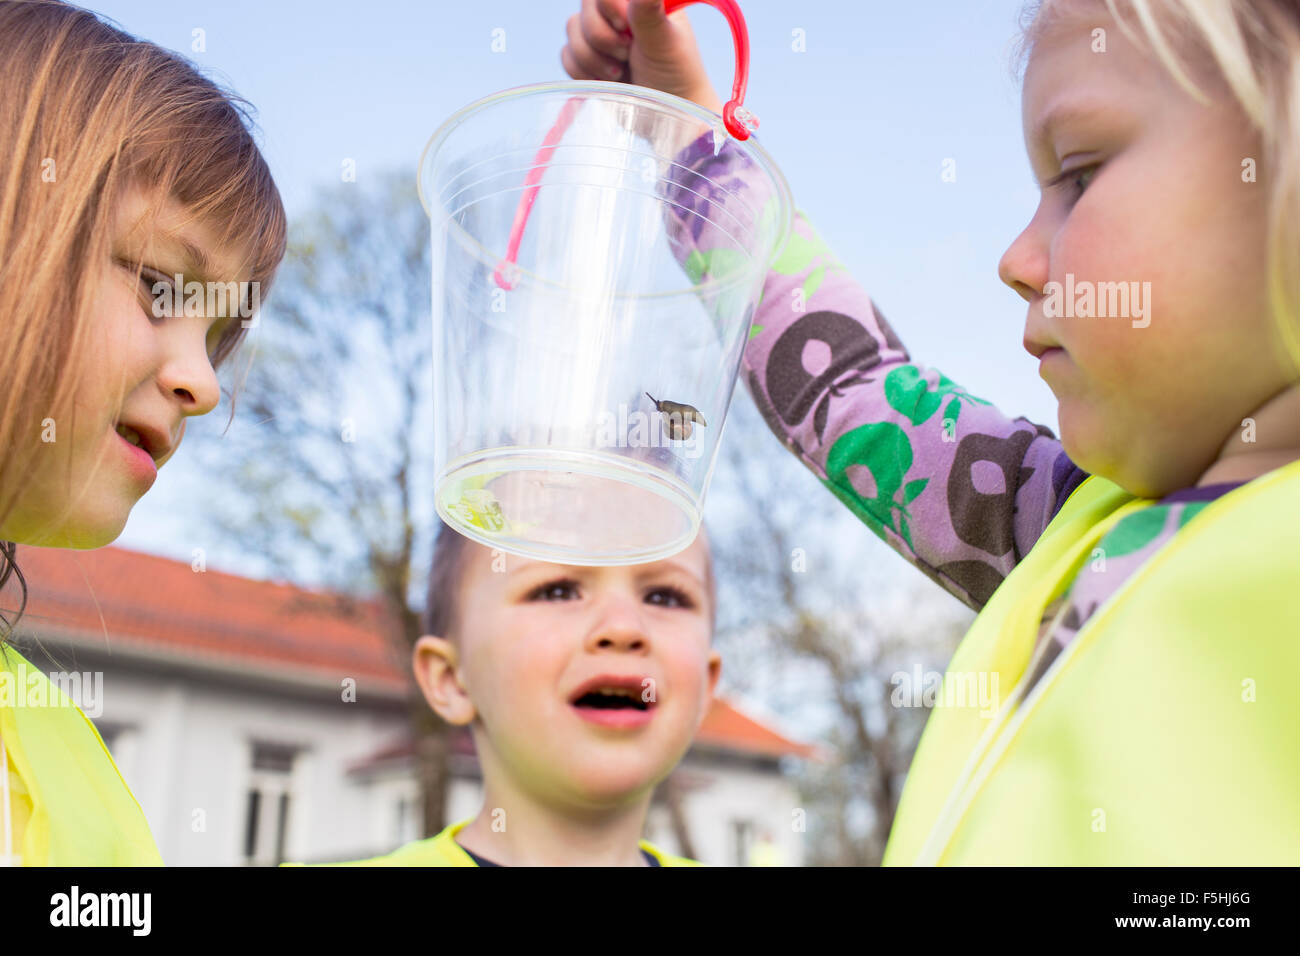 La Svezia, Vastergotland, Olofstorp, Bergum, Kindergarten bambini (2-3, 4-5) apprendimento all'aperto Immagini Stock